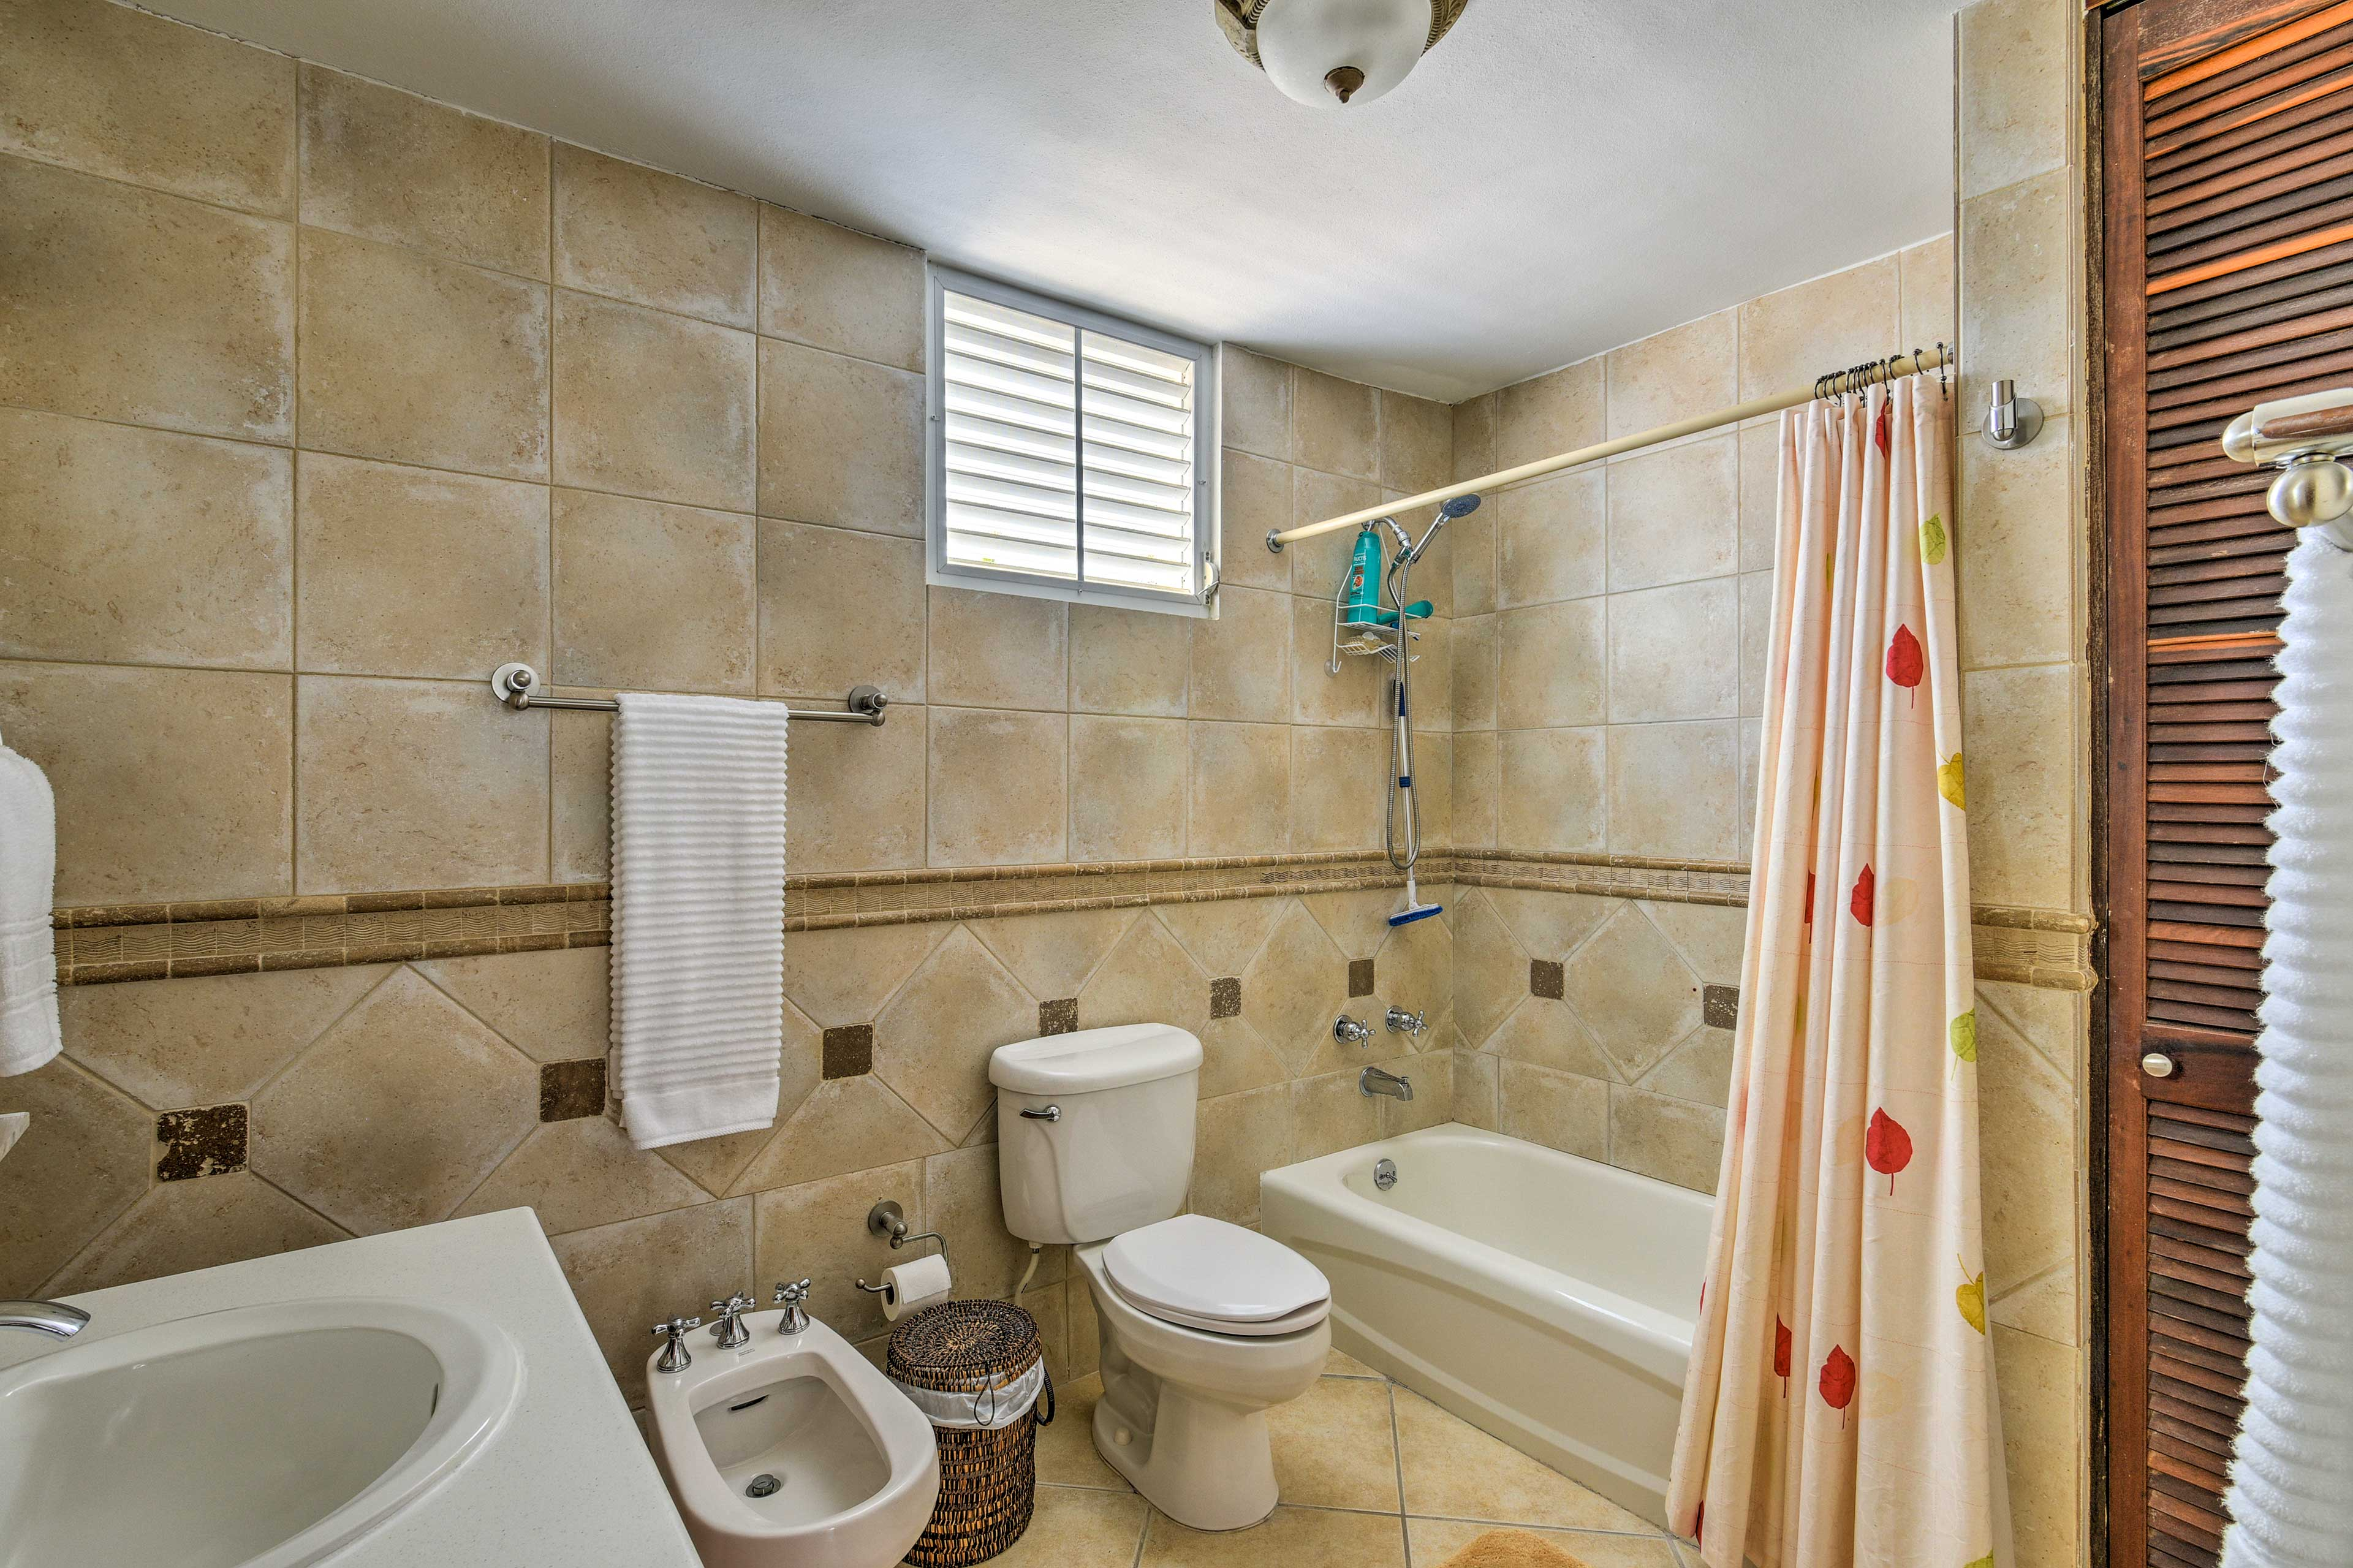 The master en-suite bathroom boasts a shower/tub combo.